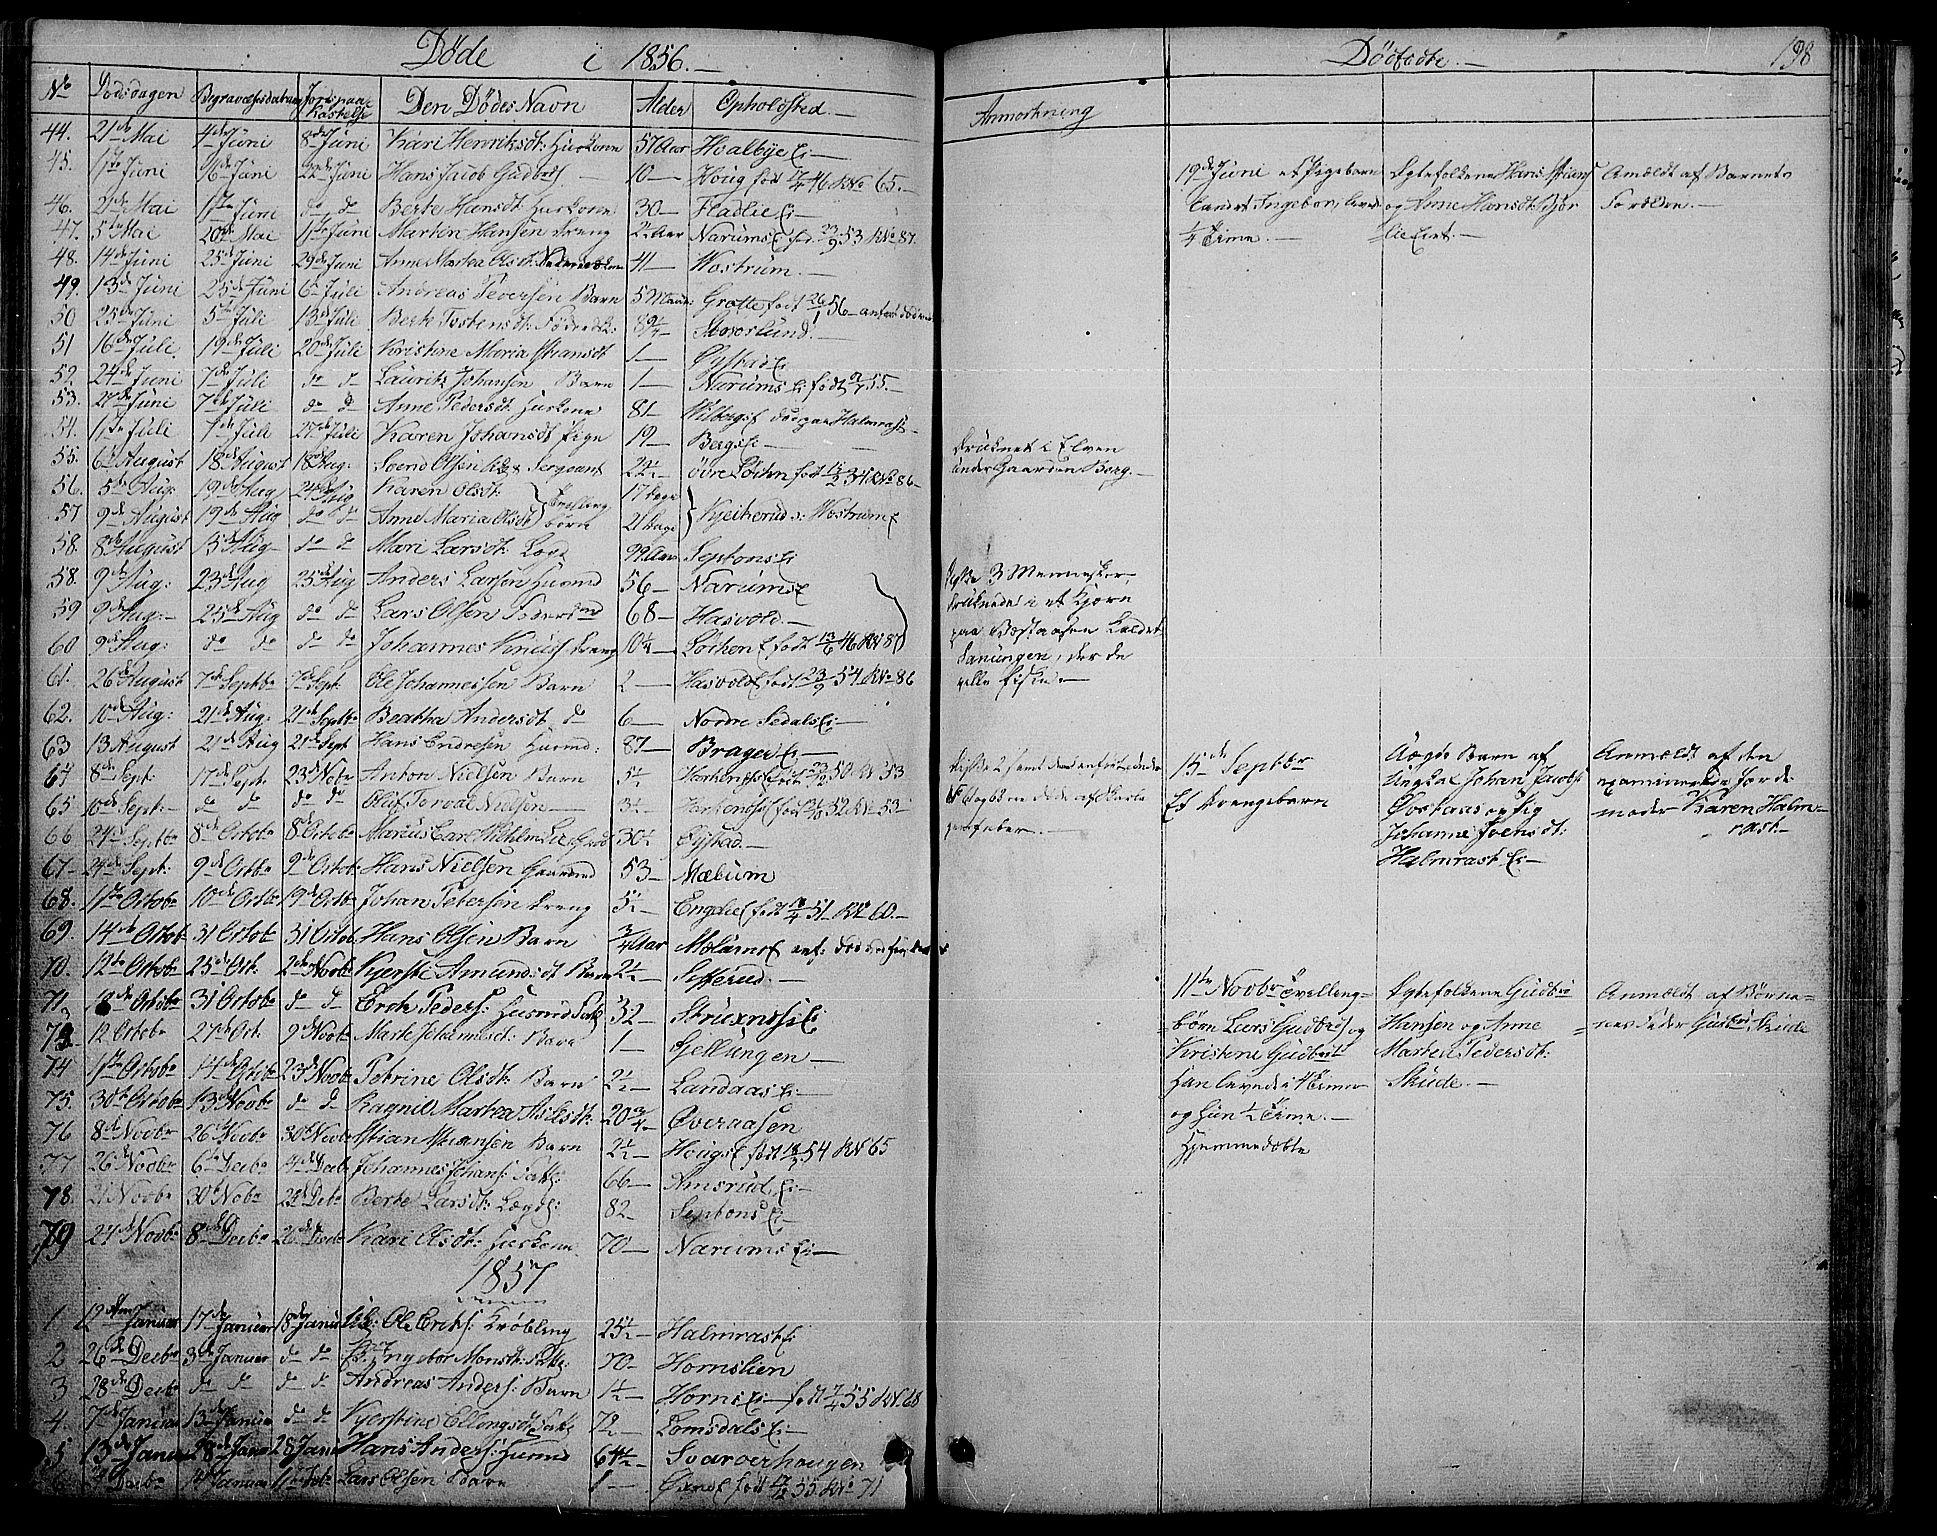 SAH, Søndre Land prestekontor, L/L0001: Klokkerbok nr. 1, 1849-1883, s. 198